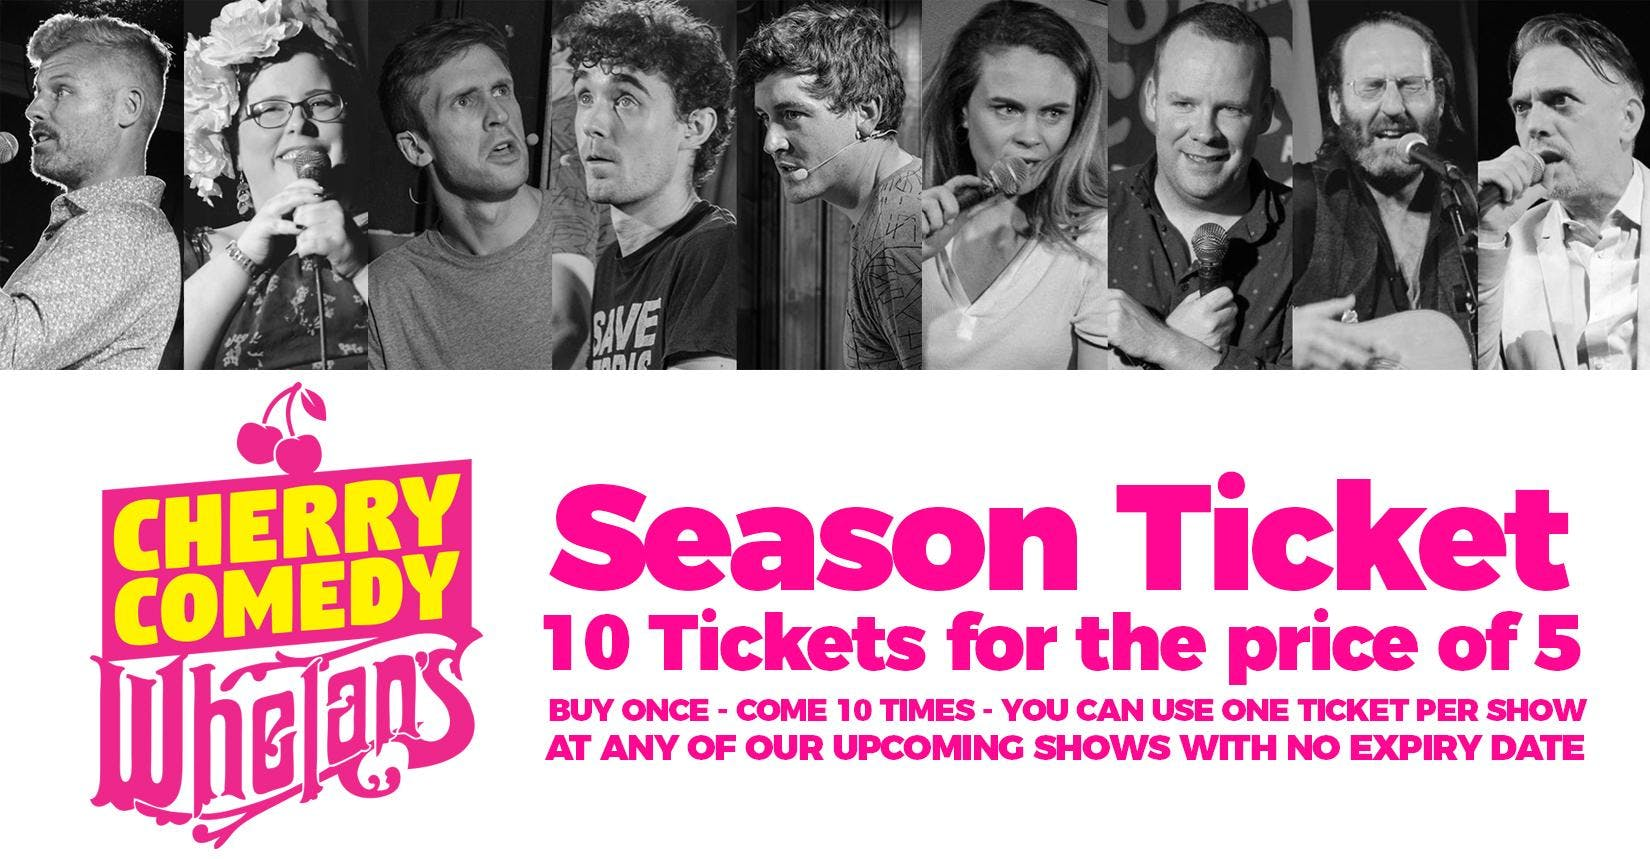 Cherry Comedy at Whelan's Season Ticket